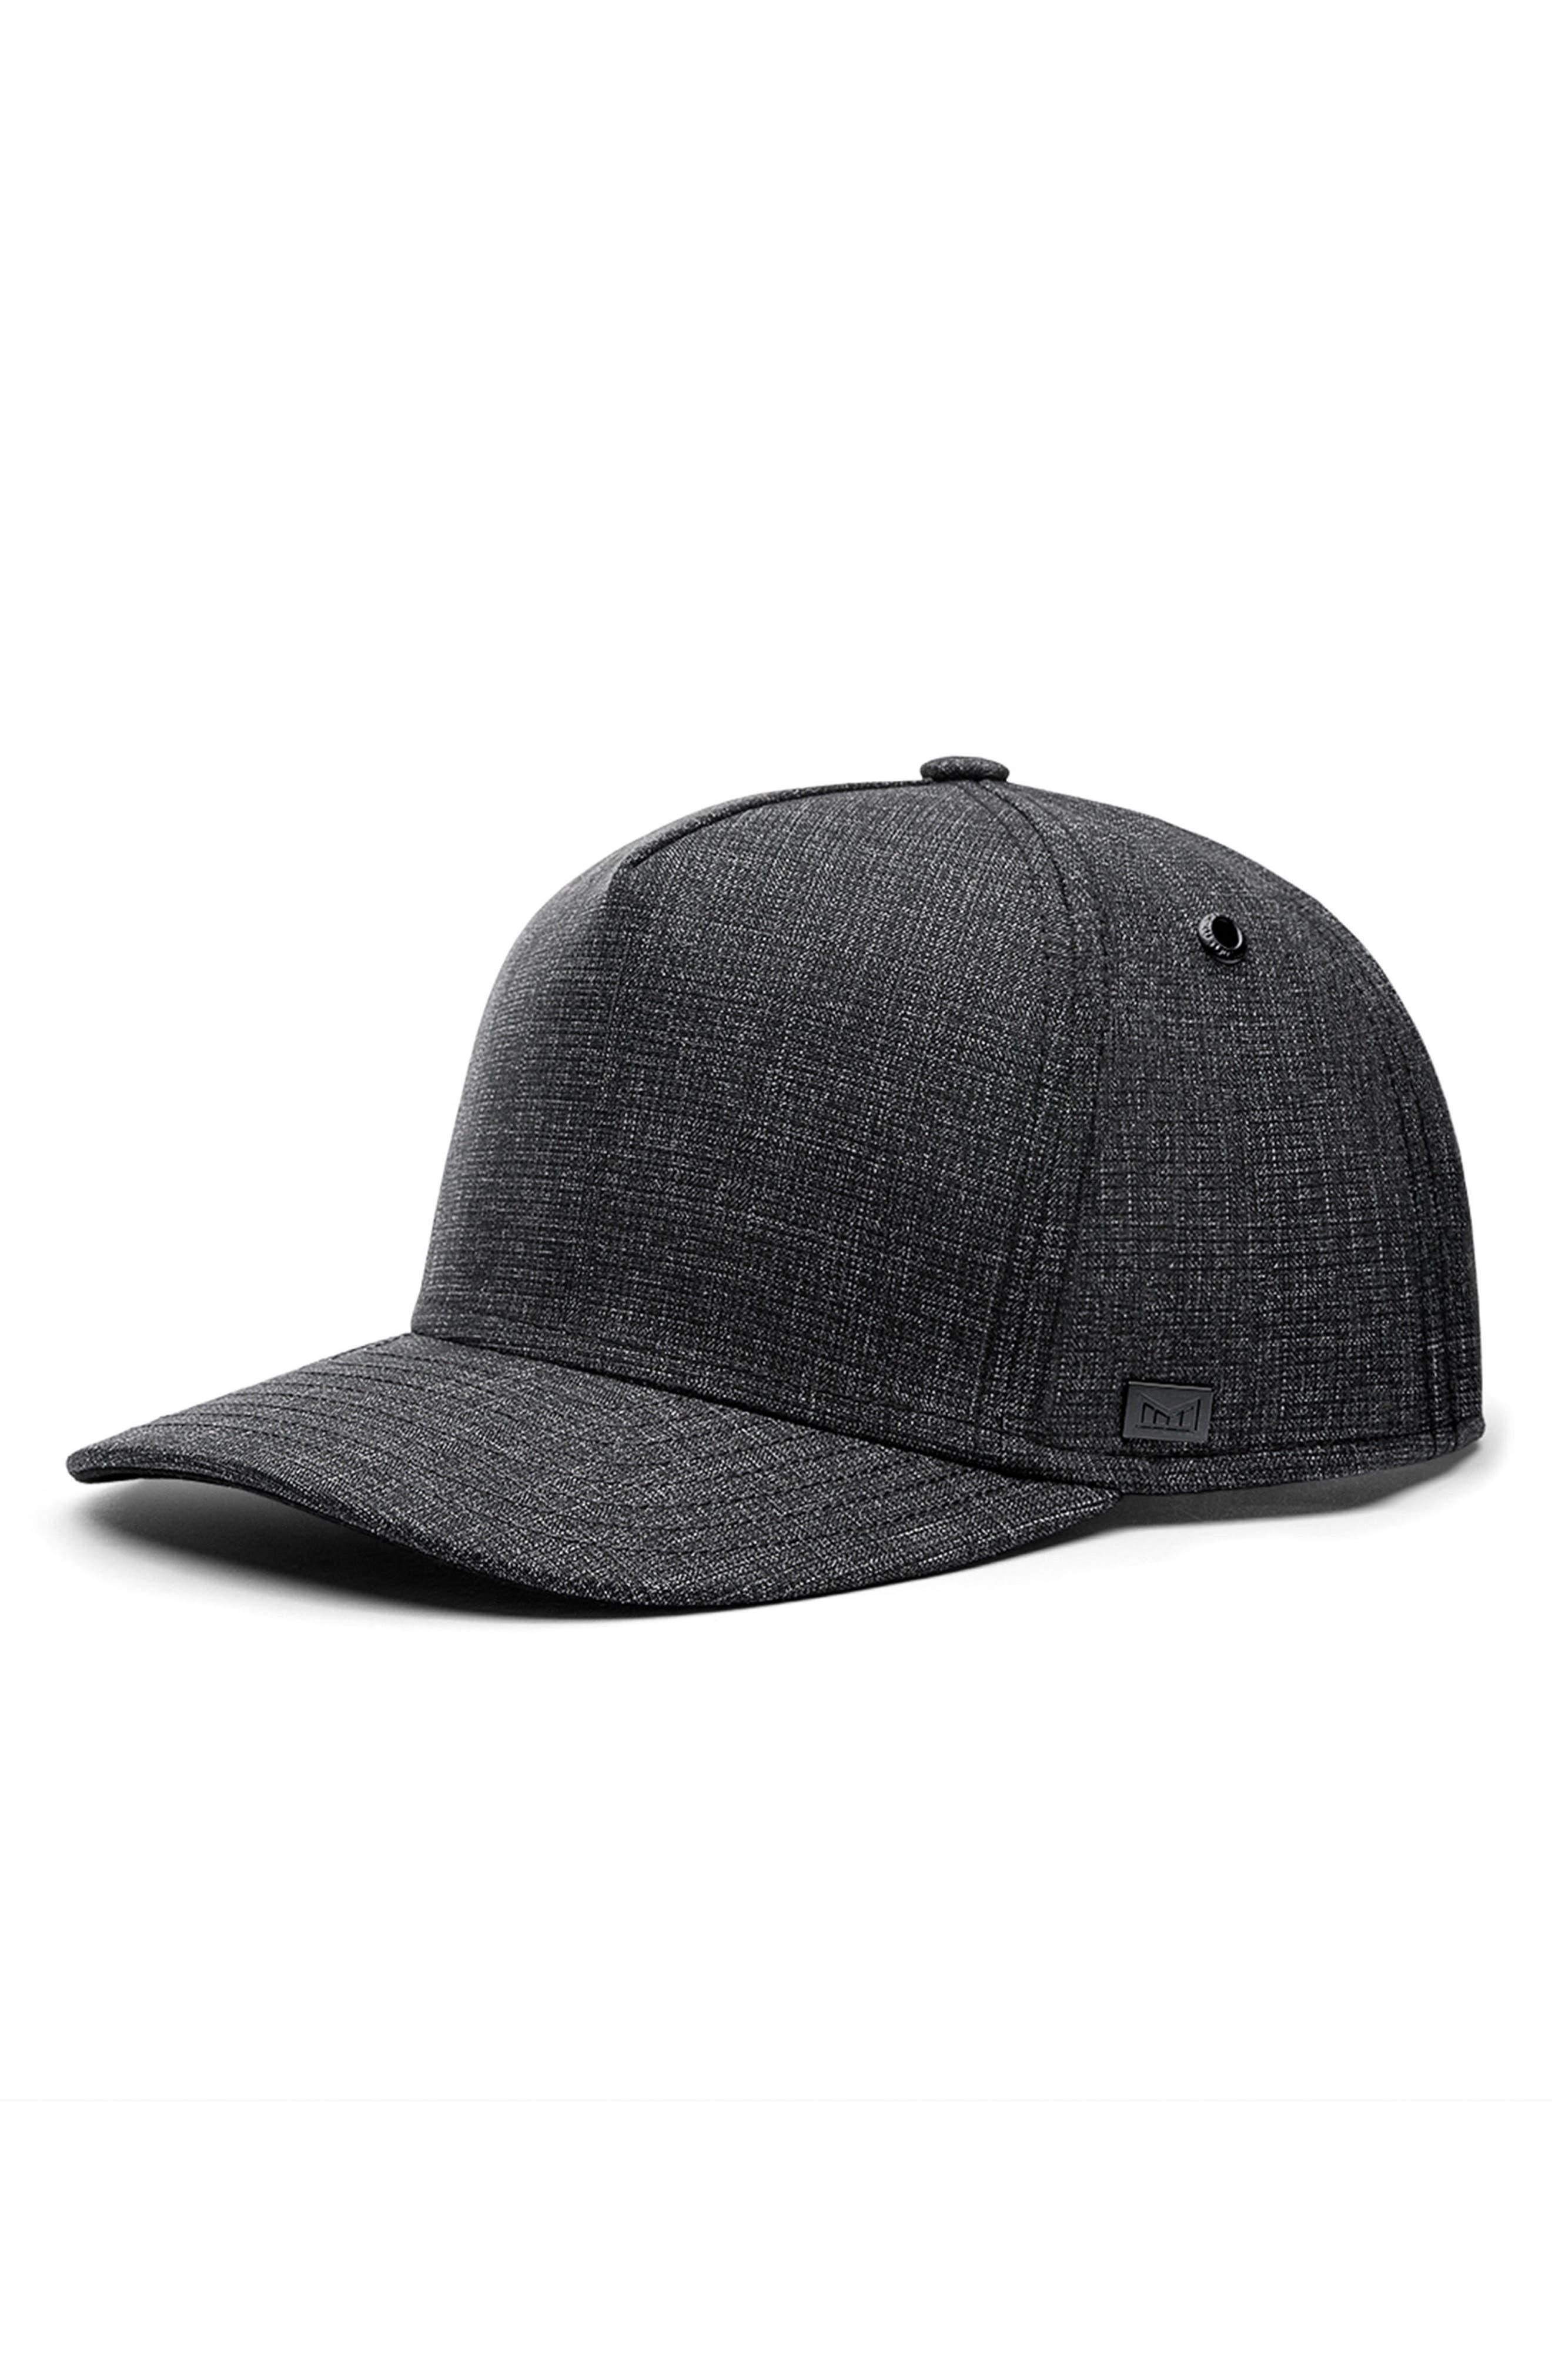 Odyssey Baseball Cap,                             Main thumbnail 1, color,                             CHARCOAL